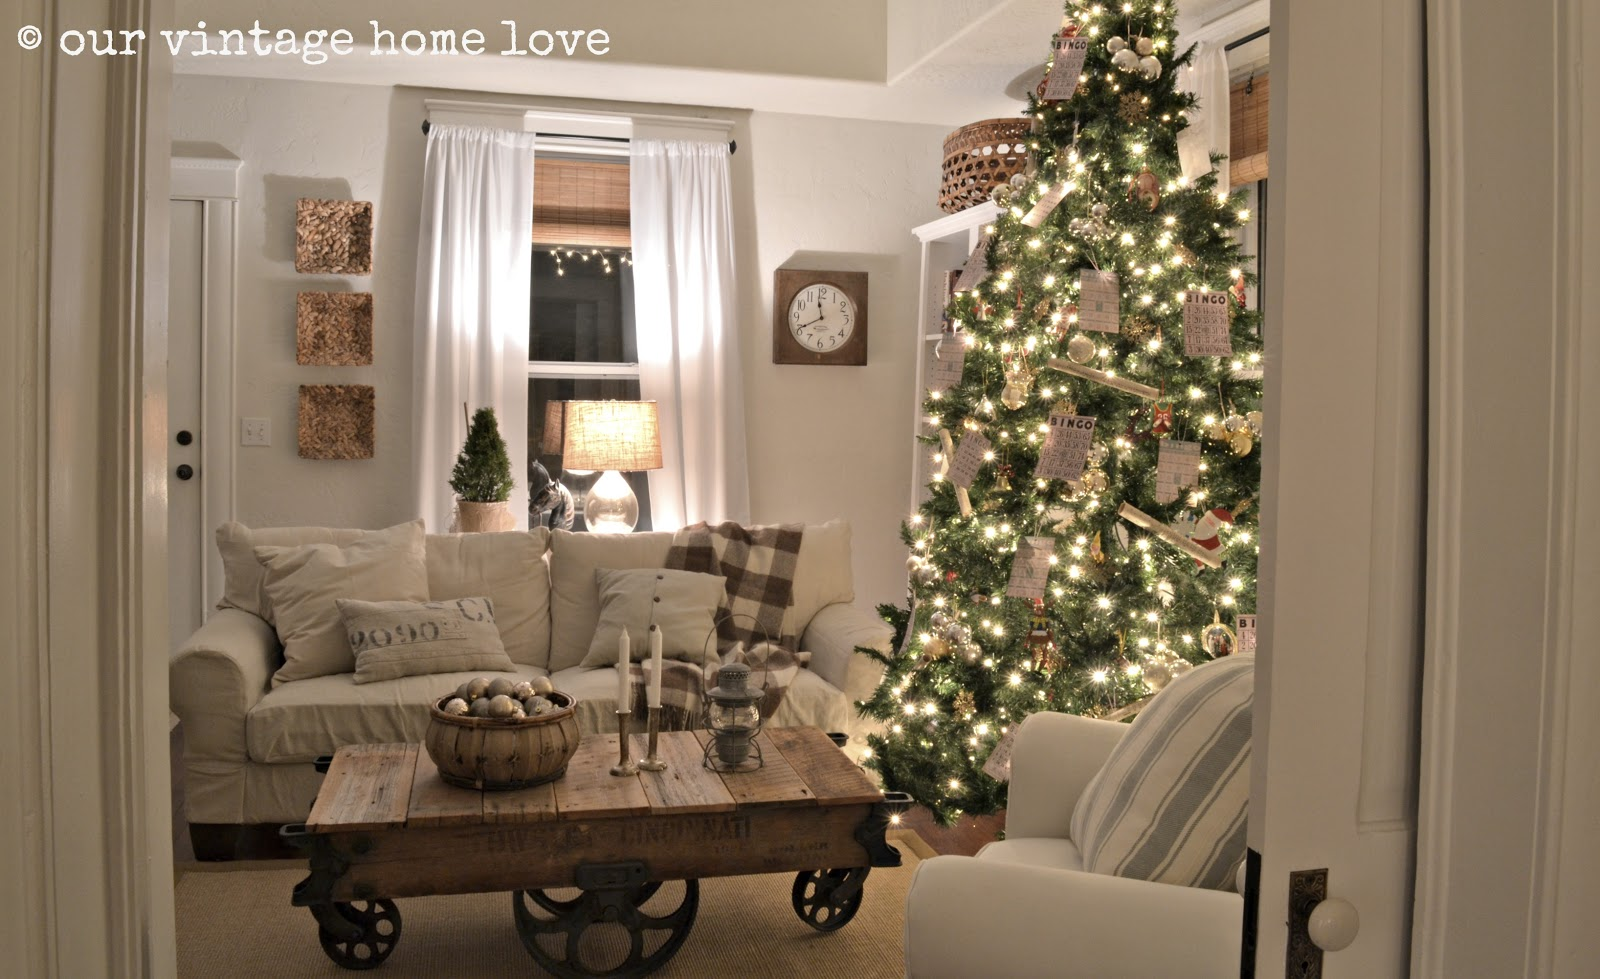 vintage home love 2012 christmas decor ideas - Vintage Christmas Home Decor